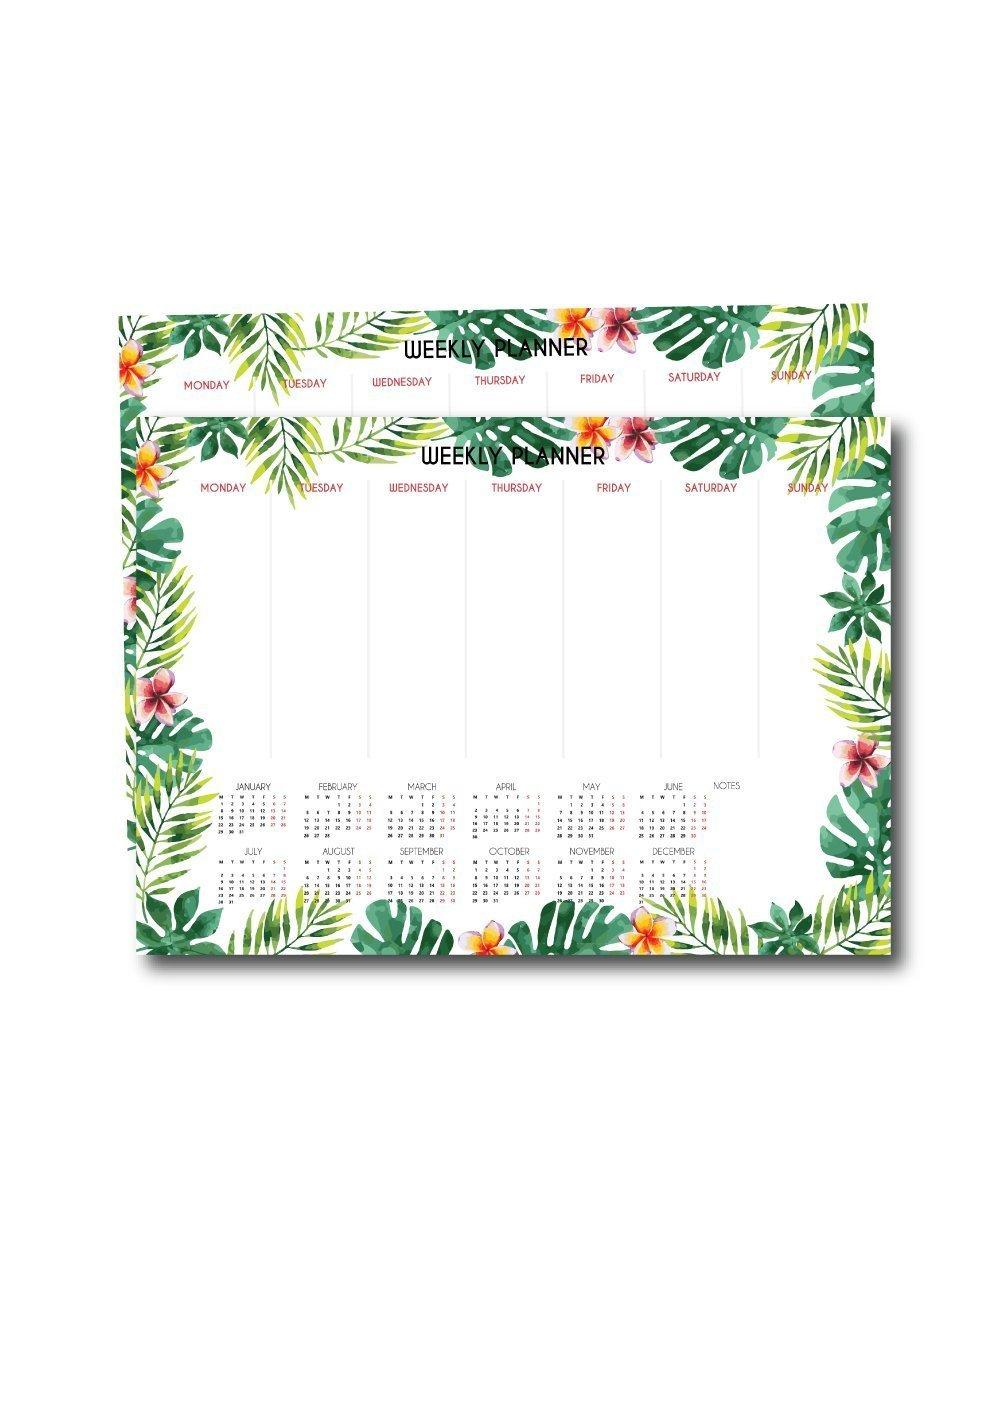 2018 Weekly Planner - Tropical